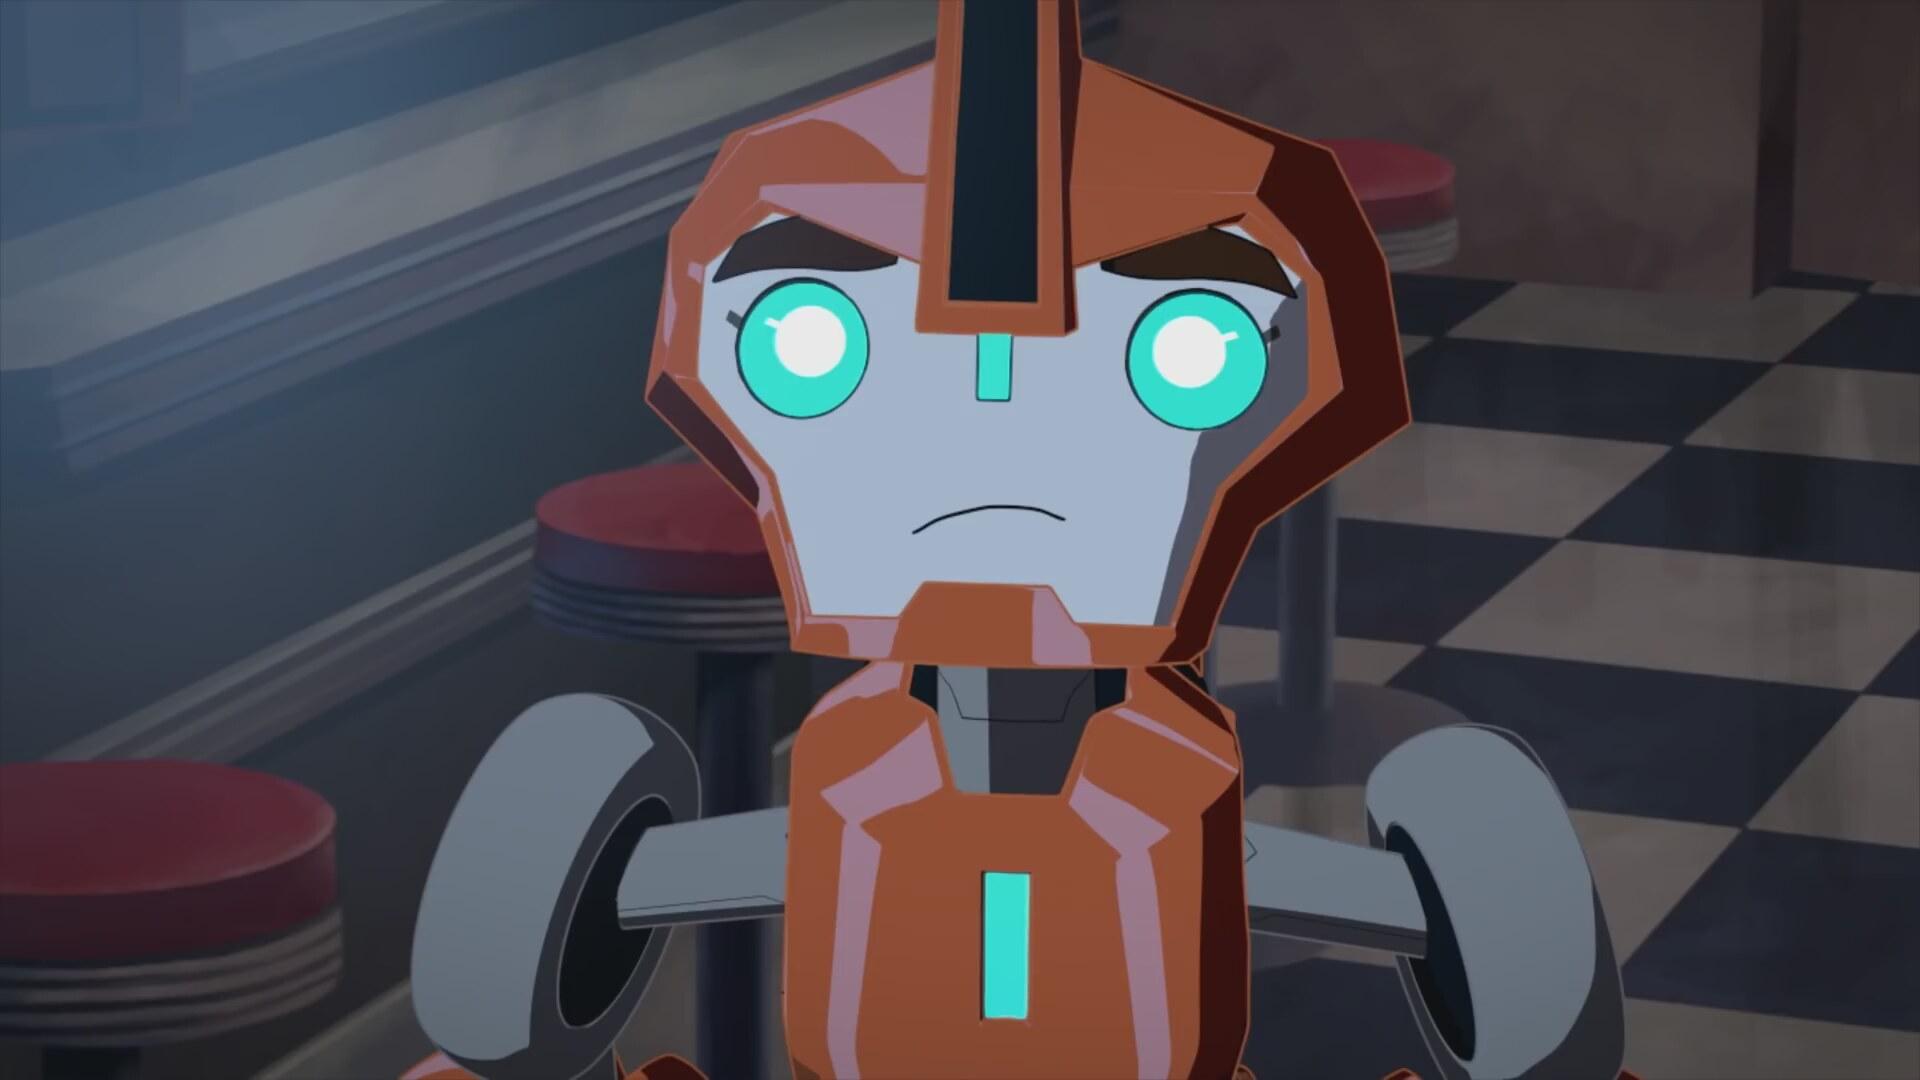 Gizlenen Robotlar Cizgi Film Transformers Turkce 10 Bolum Izlesene Com